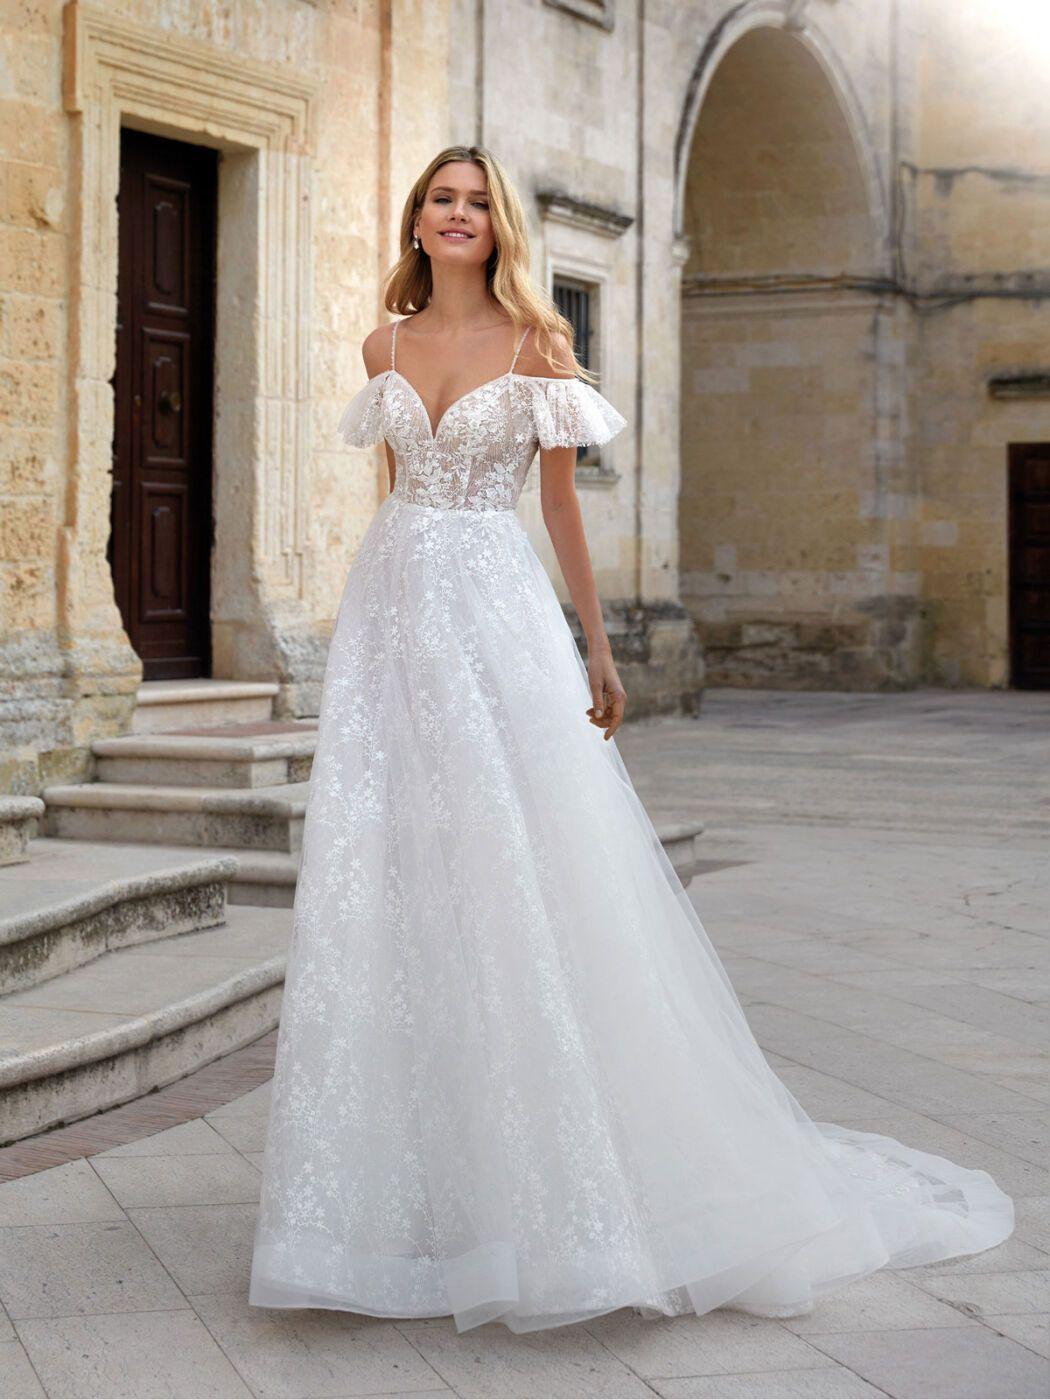 https://www.weddingmagazine.com.ua/wp-content/uploads/2020/06/romance-nicole-2021-bridal-collection.jpg